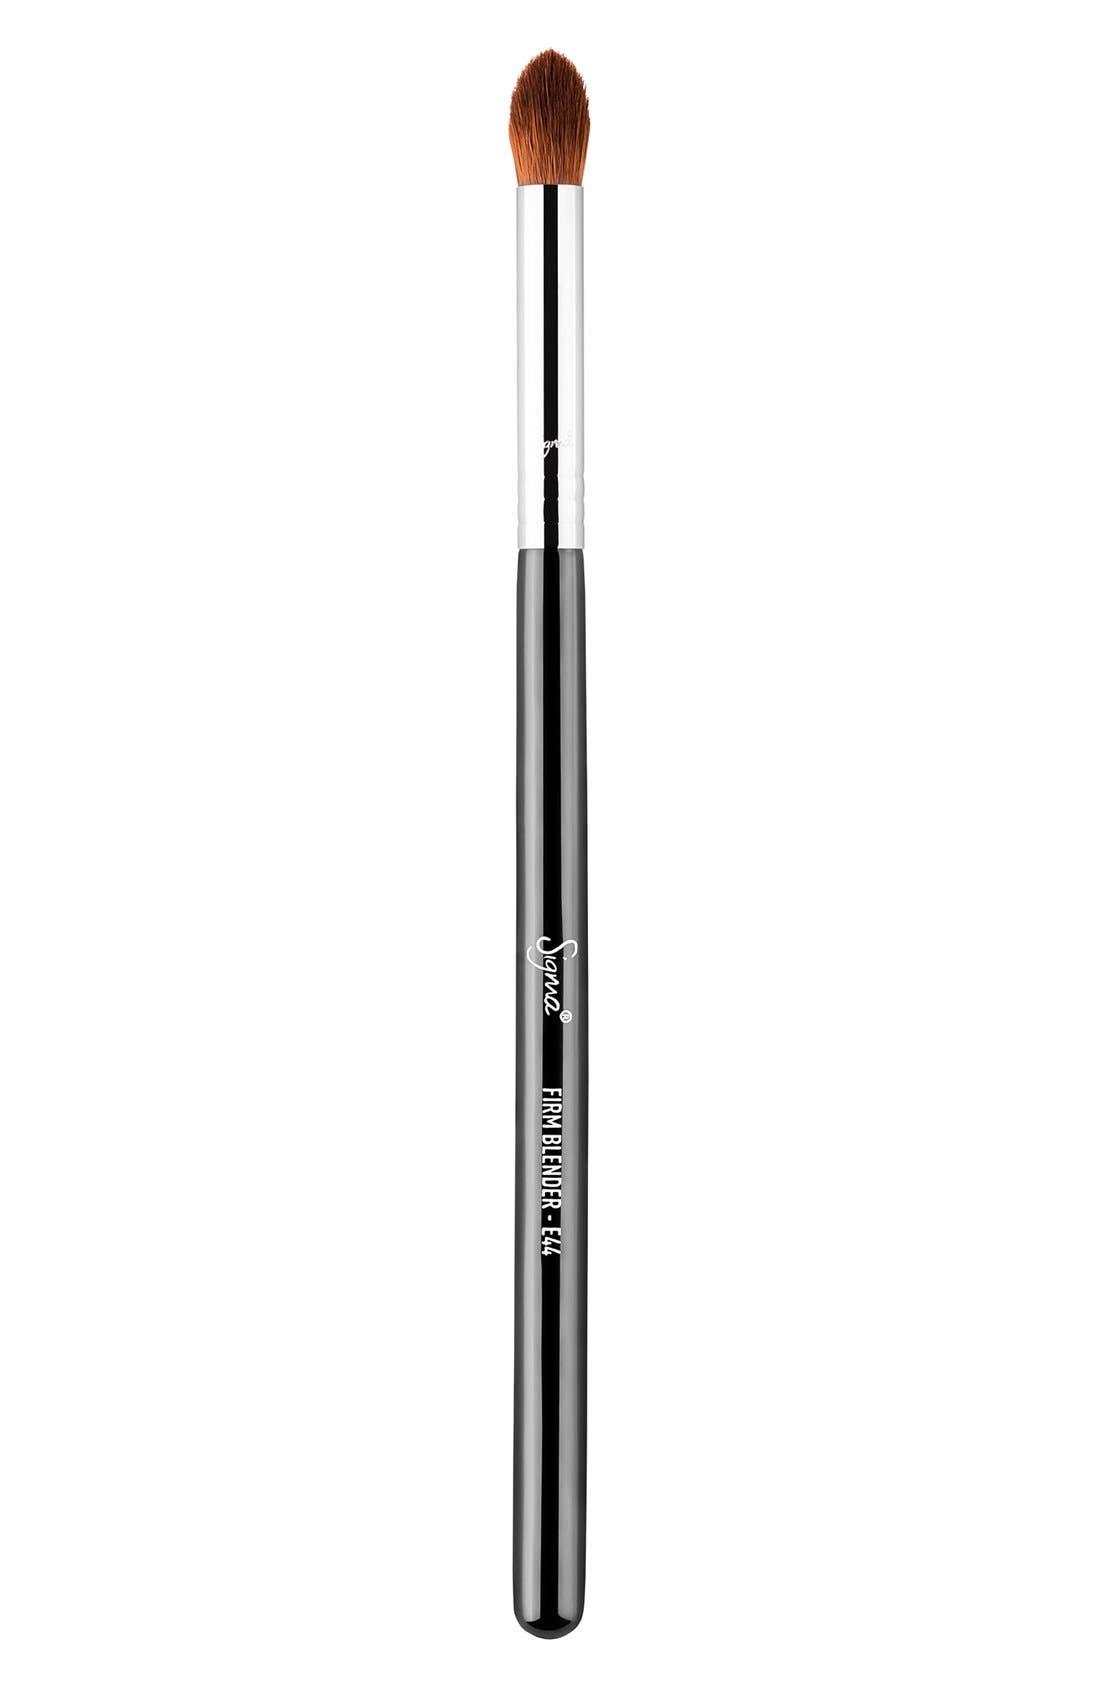 E44 Firm Blender Brush,                             Main thumbnail 1, color,                             NO COLOR